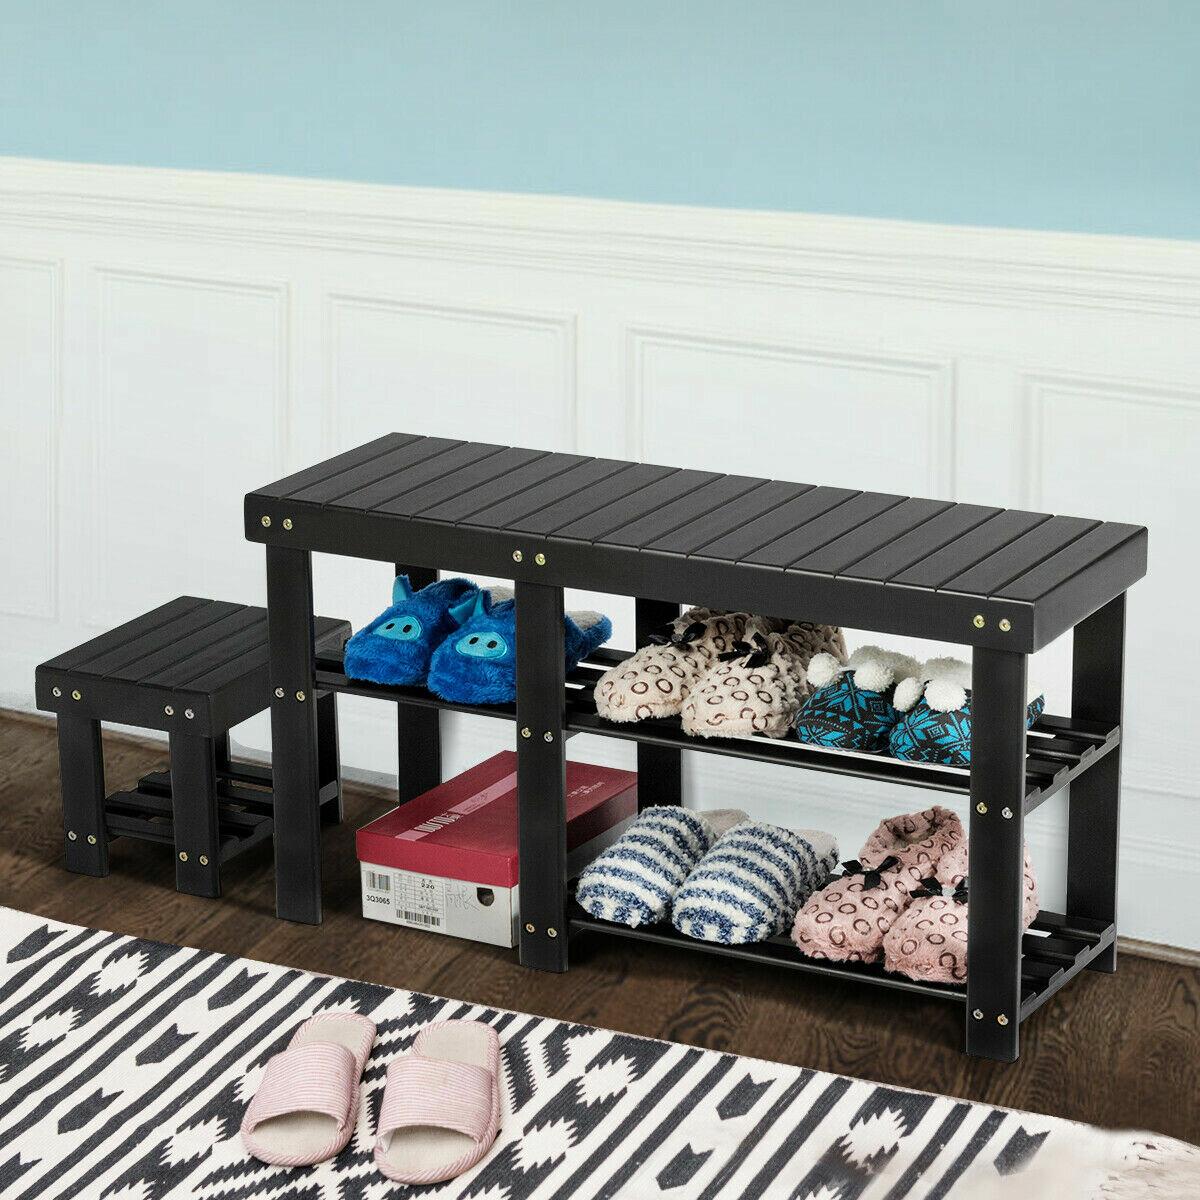 Latitude Run Bamboo Shoe Rack Bench With Stool Entryway 3 Tier Storage Organizer Black Reviews Wayfair,Bright Orange Kitchen Accessories